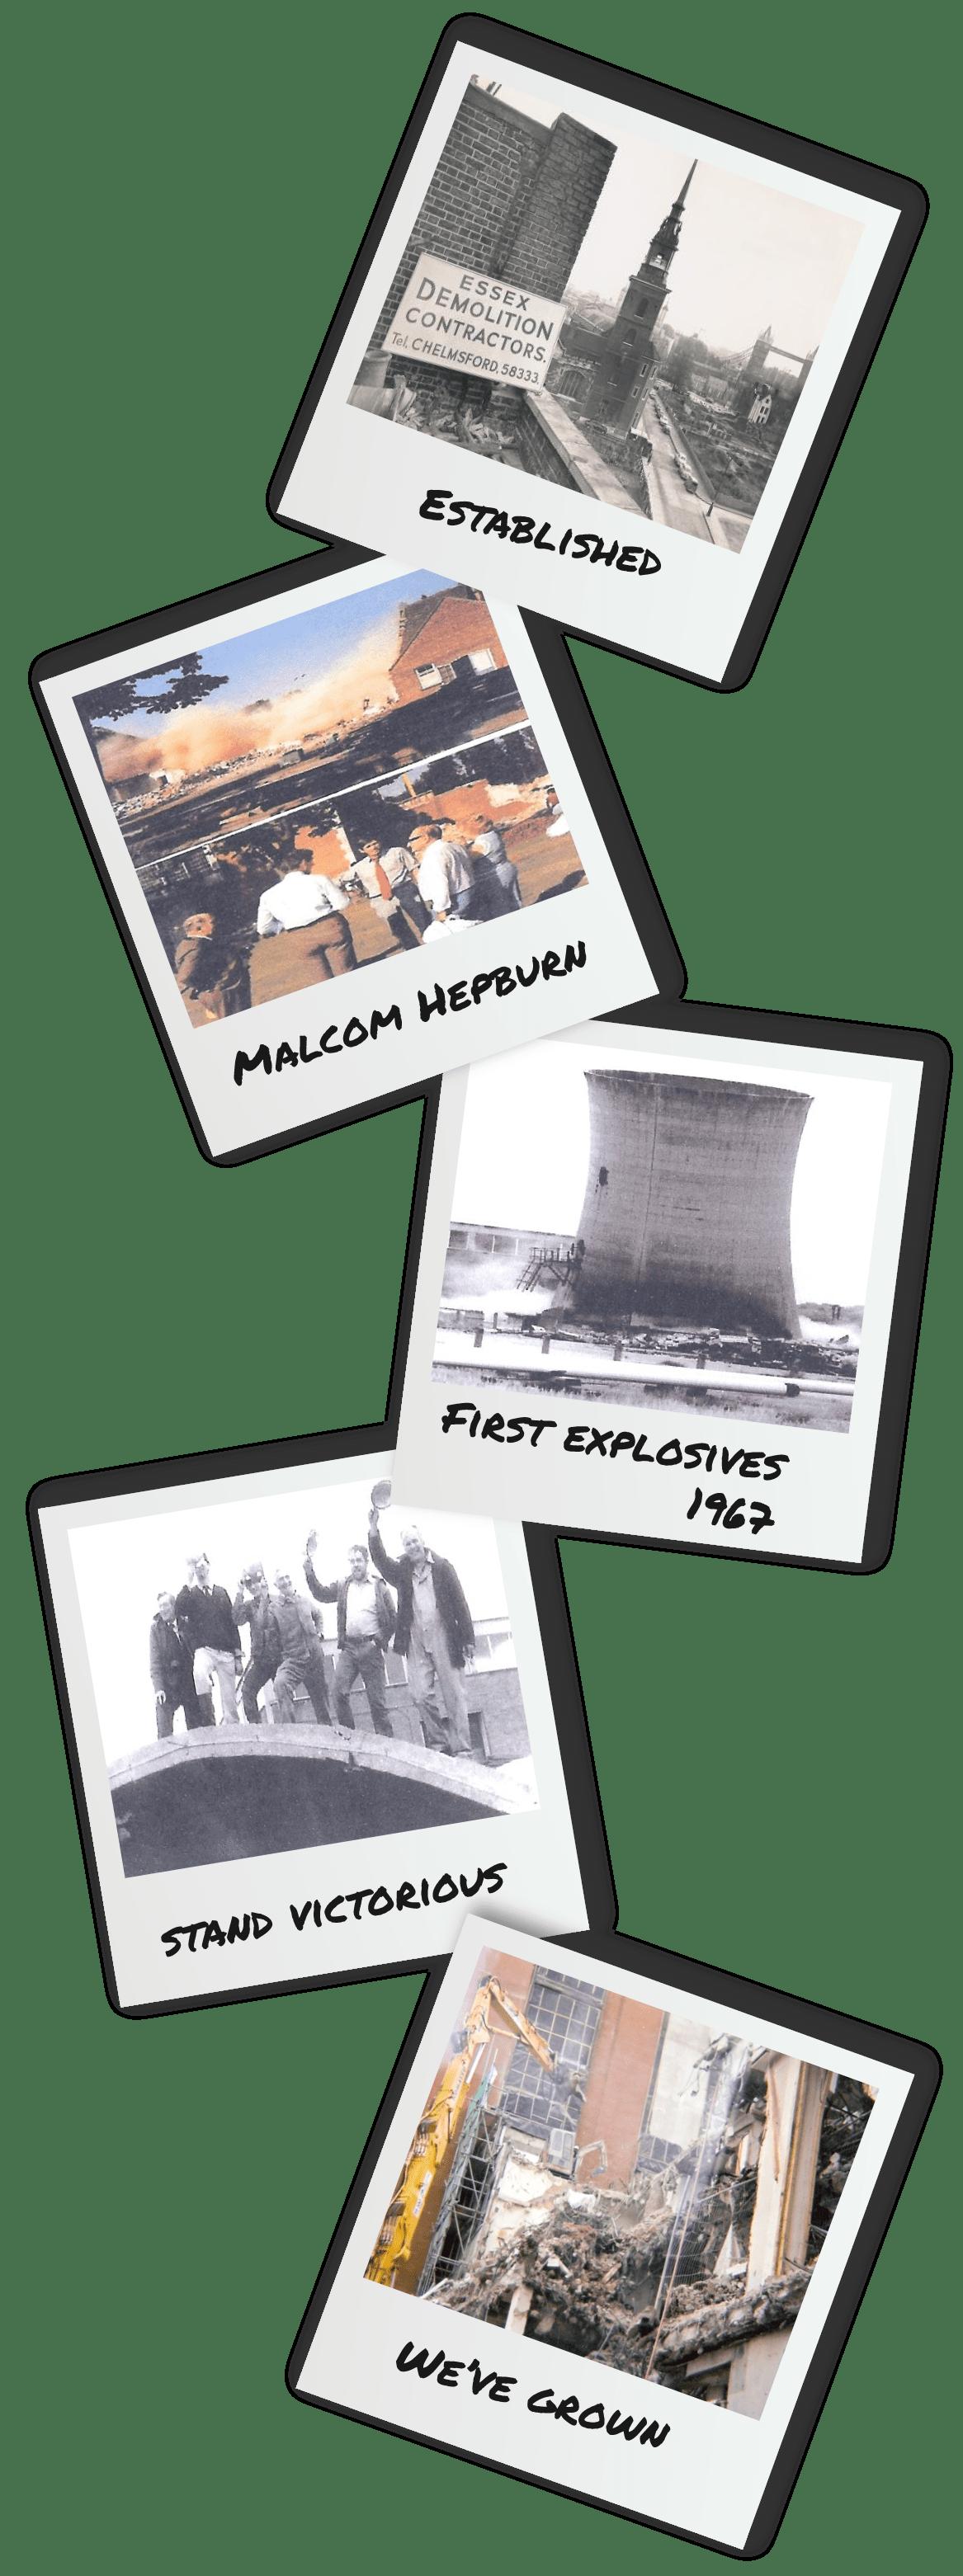 Essex Dem Co. - History